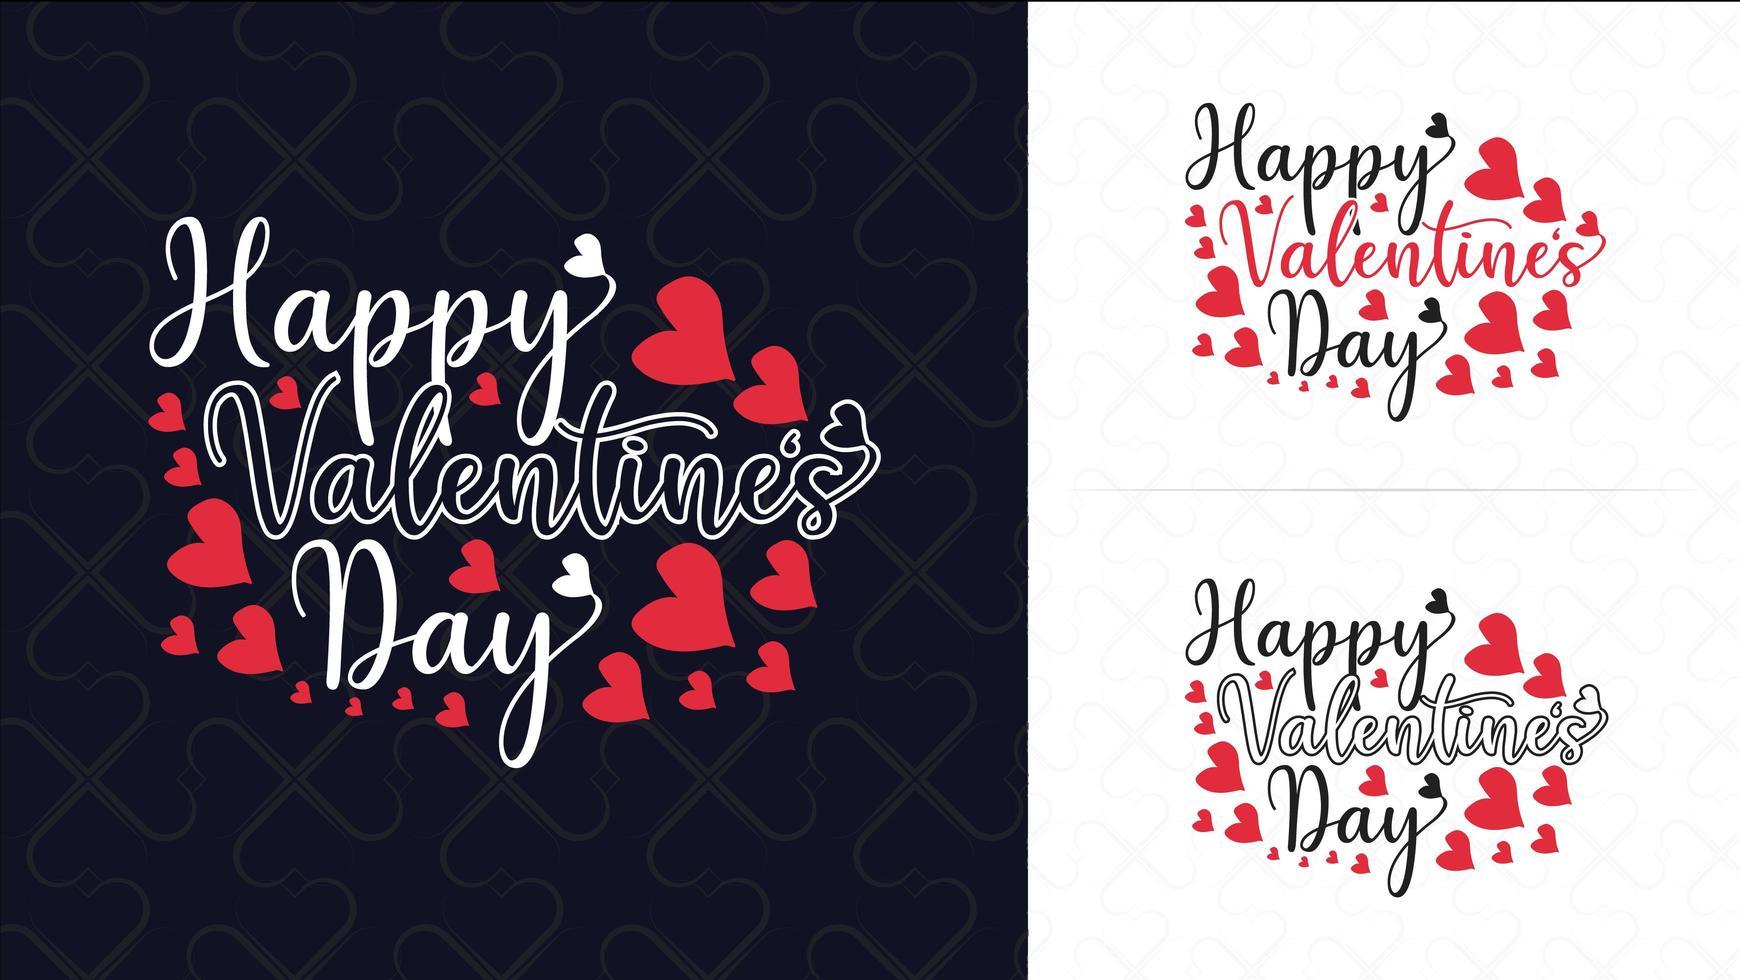 Typographie Happy Valentines Day